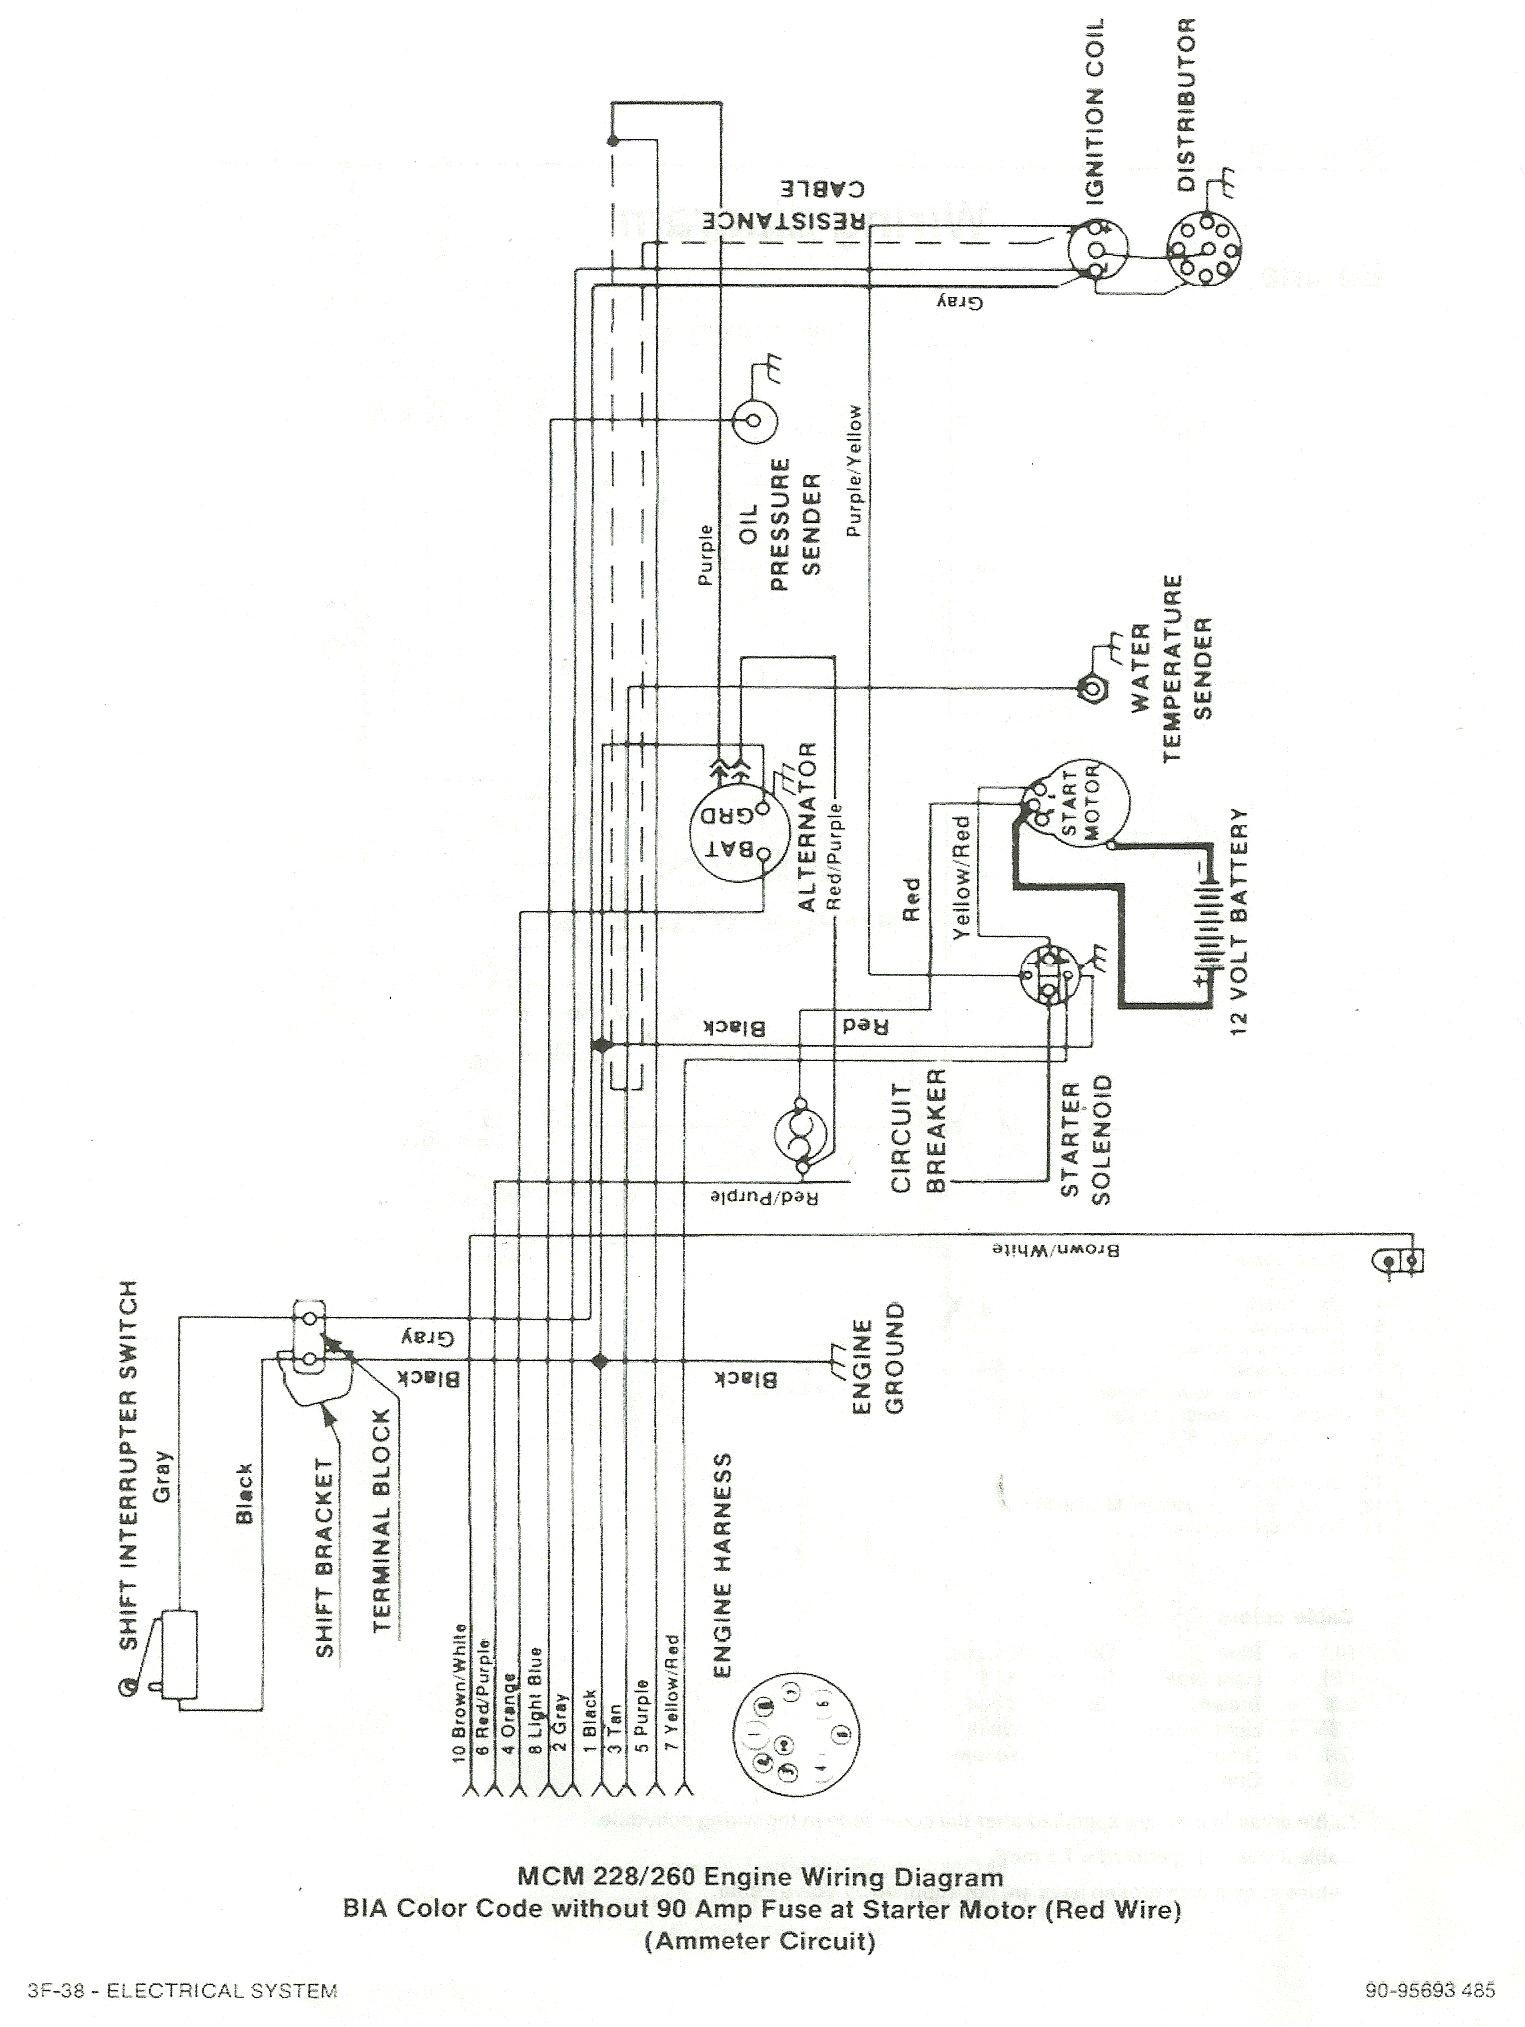 mercruiser 5 0 engine diagram wiring diagram for you1979 mercruiser 5 0 engine diagram wiring diagram